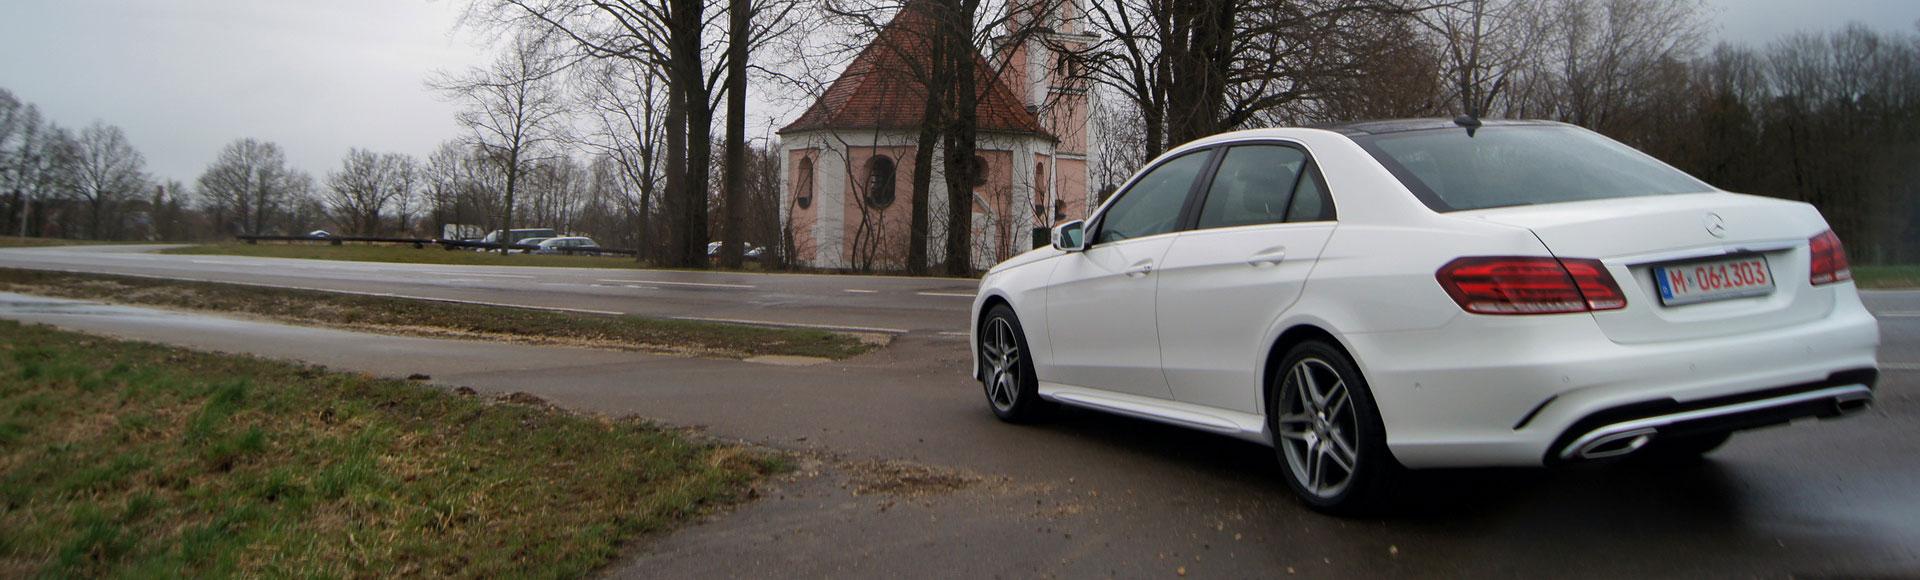 Mercedes Benz E 220 CDI AMG Sportpaket 2014 Winter 9508